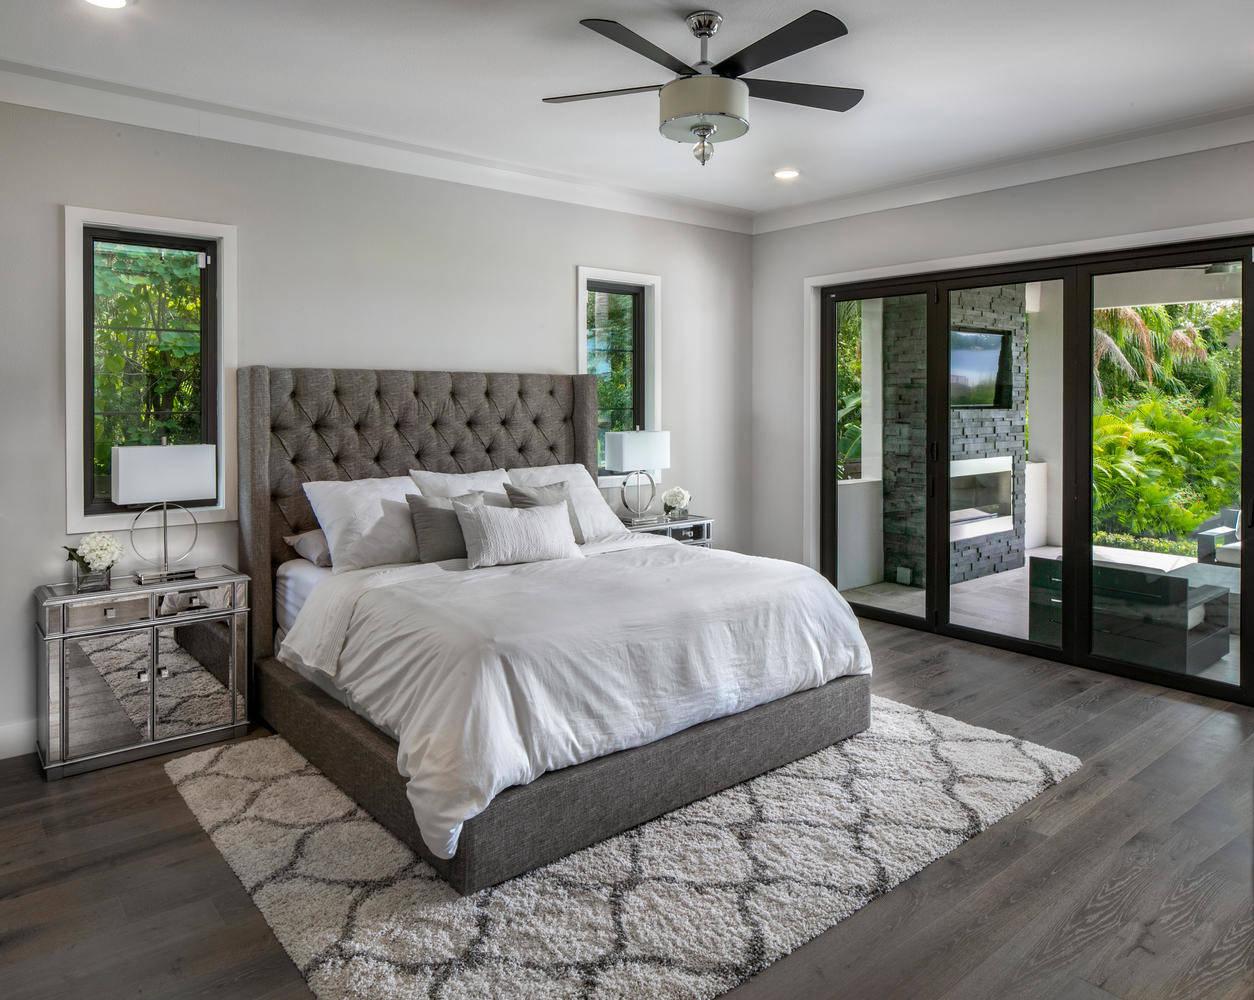 modern bedroom interior design indian style